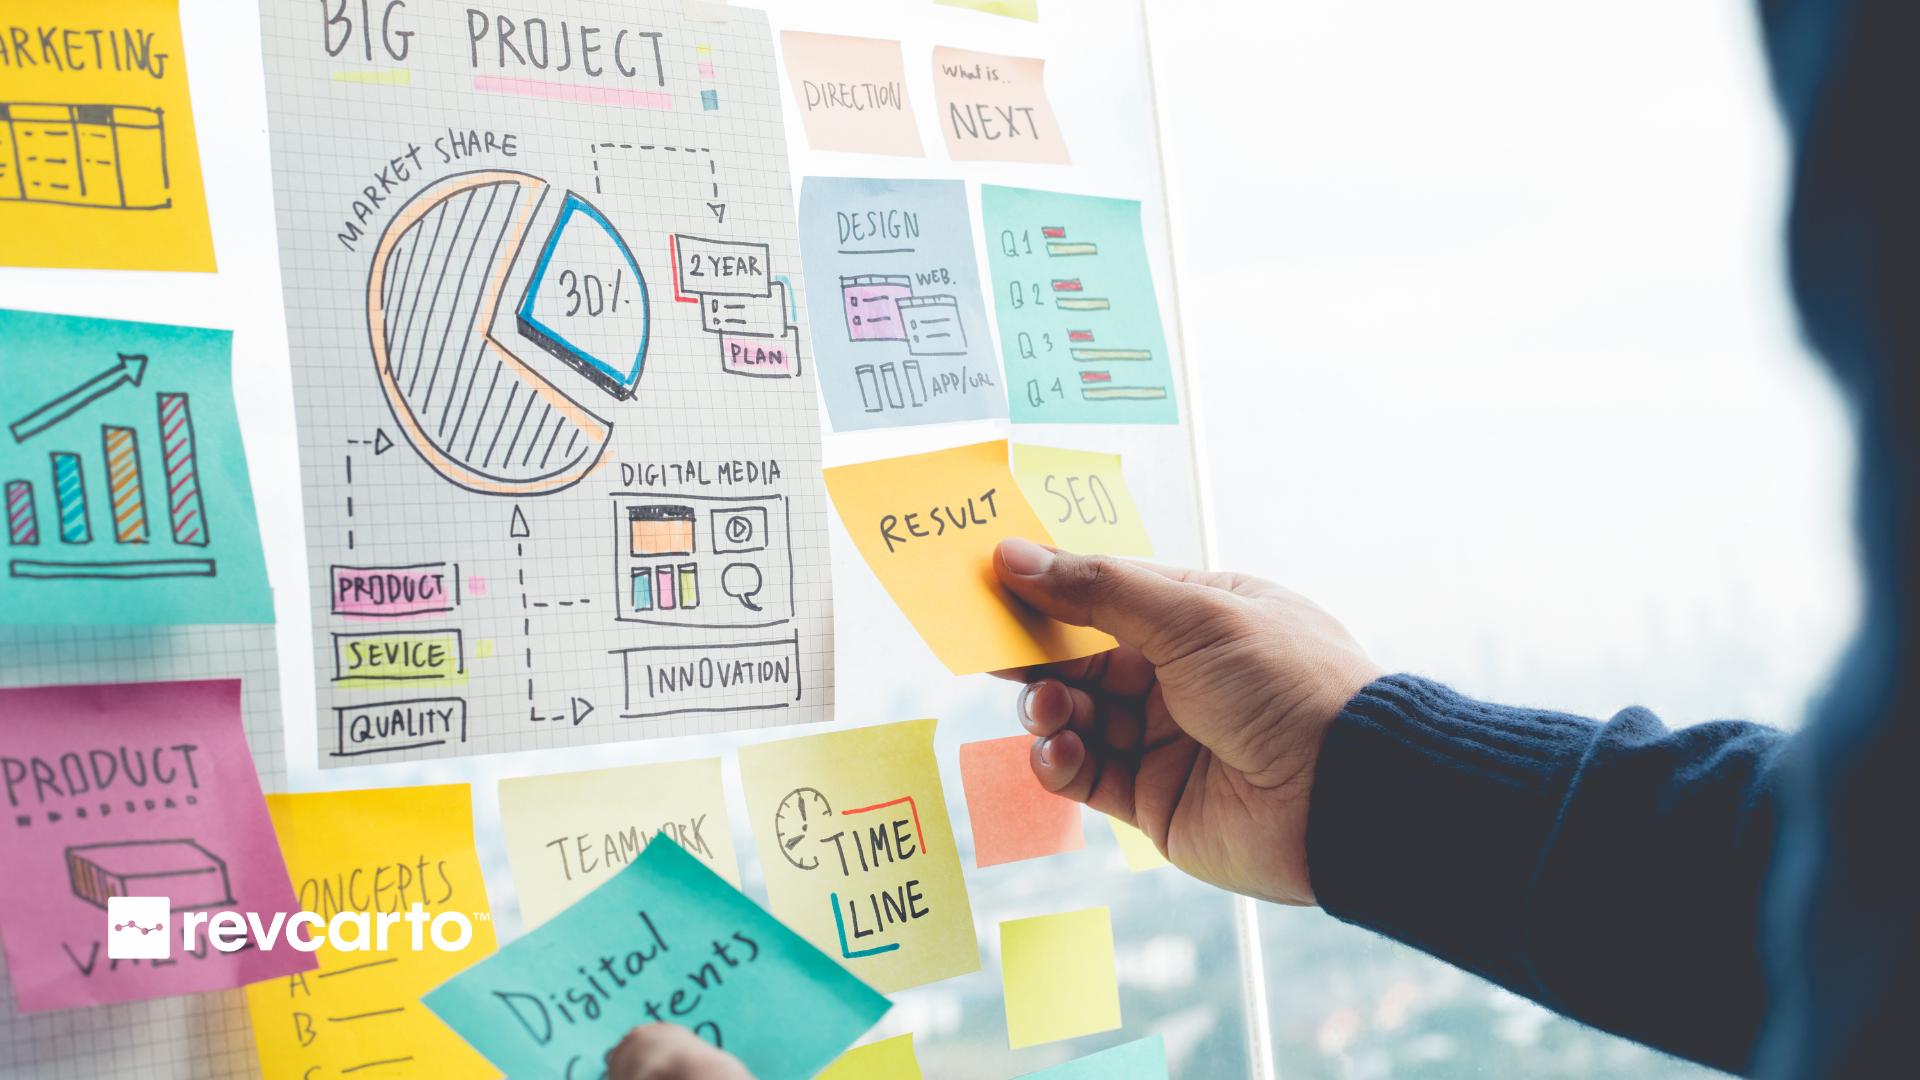 Digital Marketing Strategy Being Made Revcarto